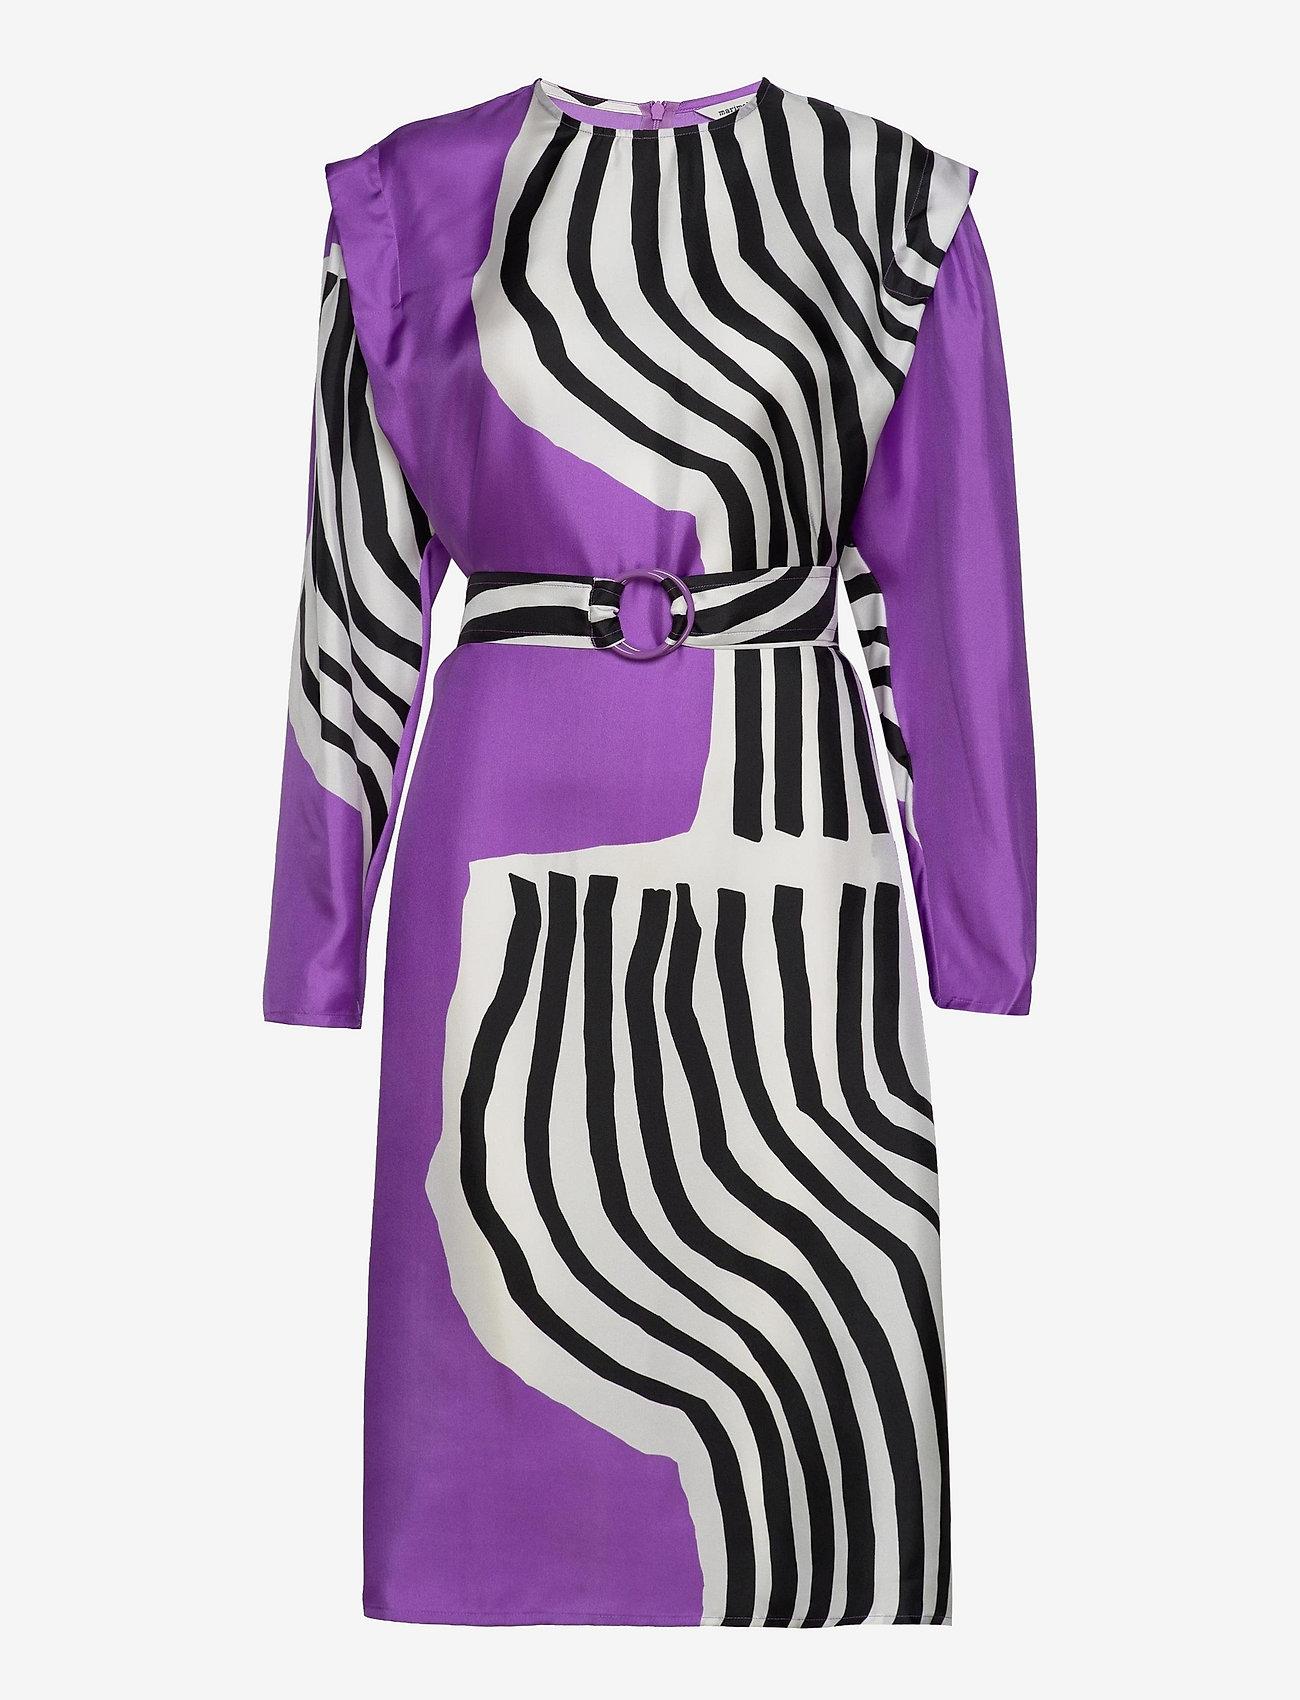 Marimekko - RAUTIAS VUOLU DRESS - cocktailkjoler - violet, off-white, black - 0